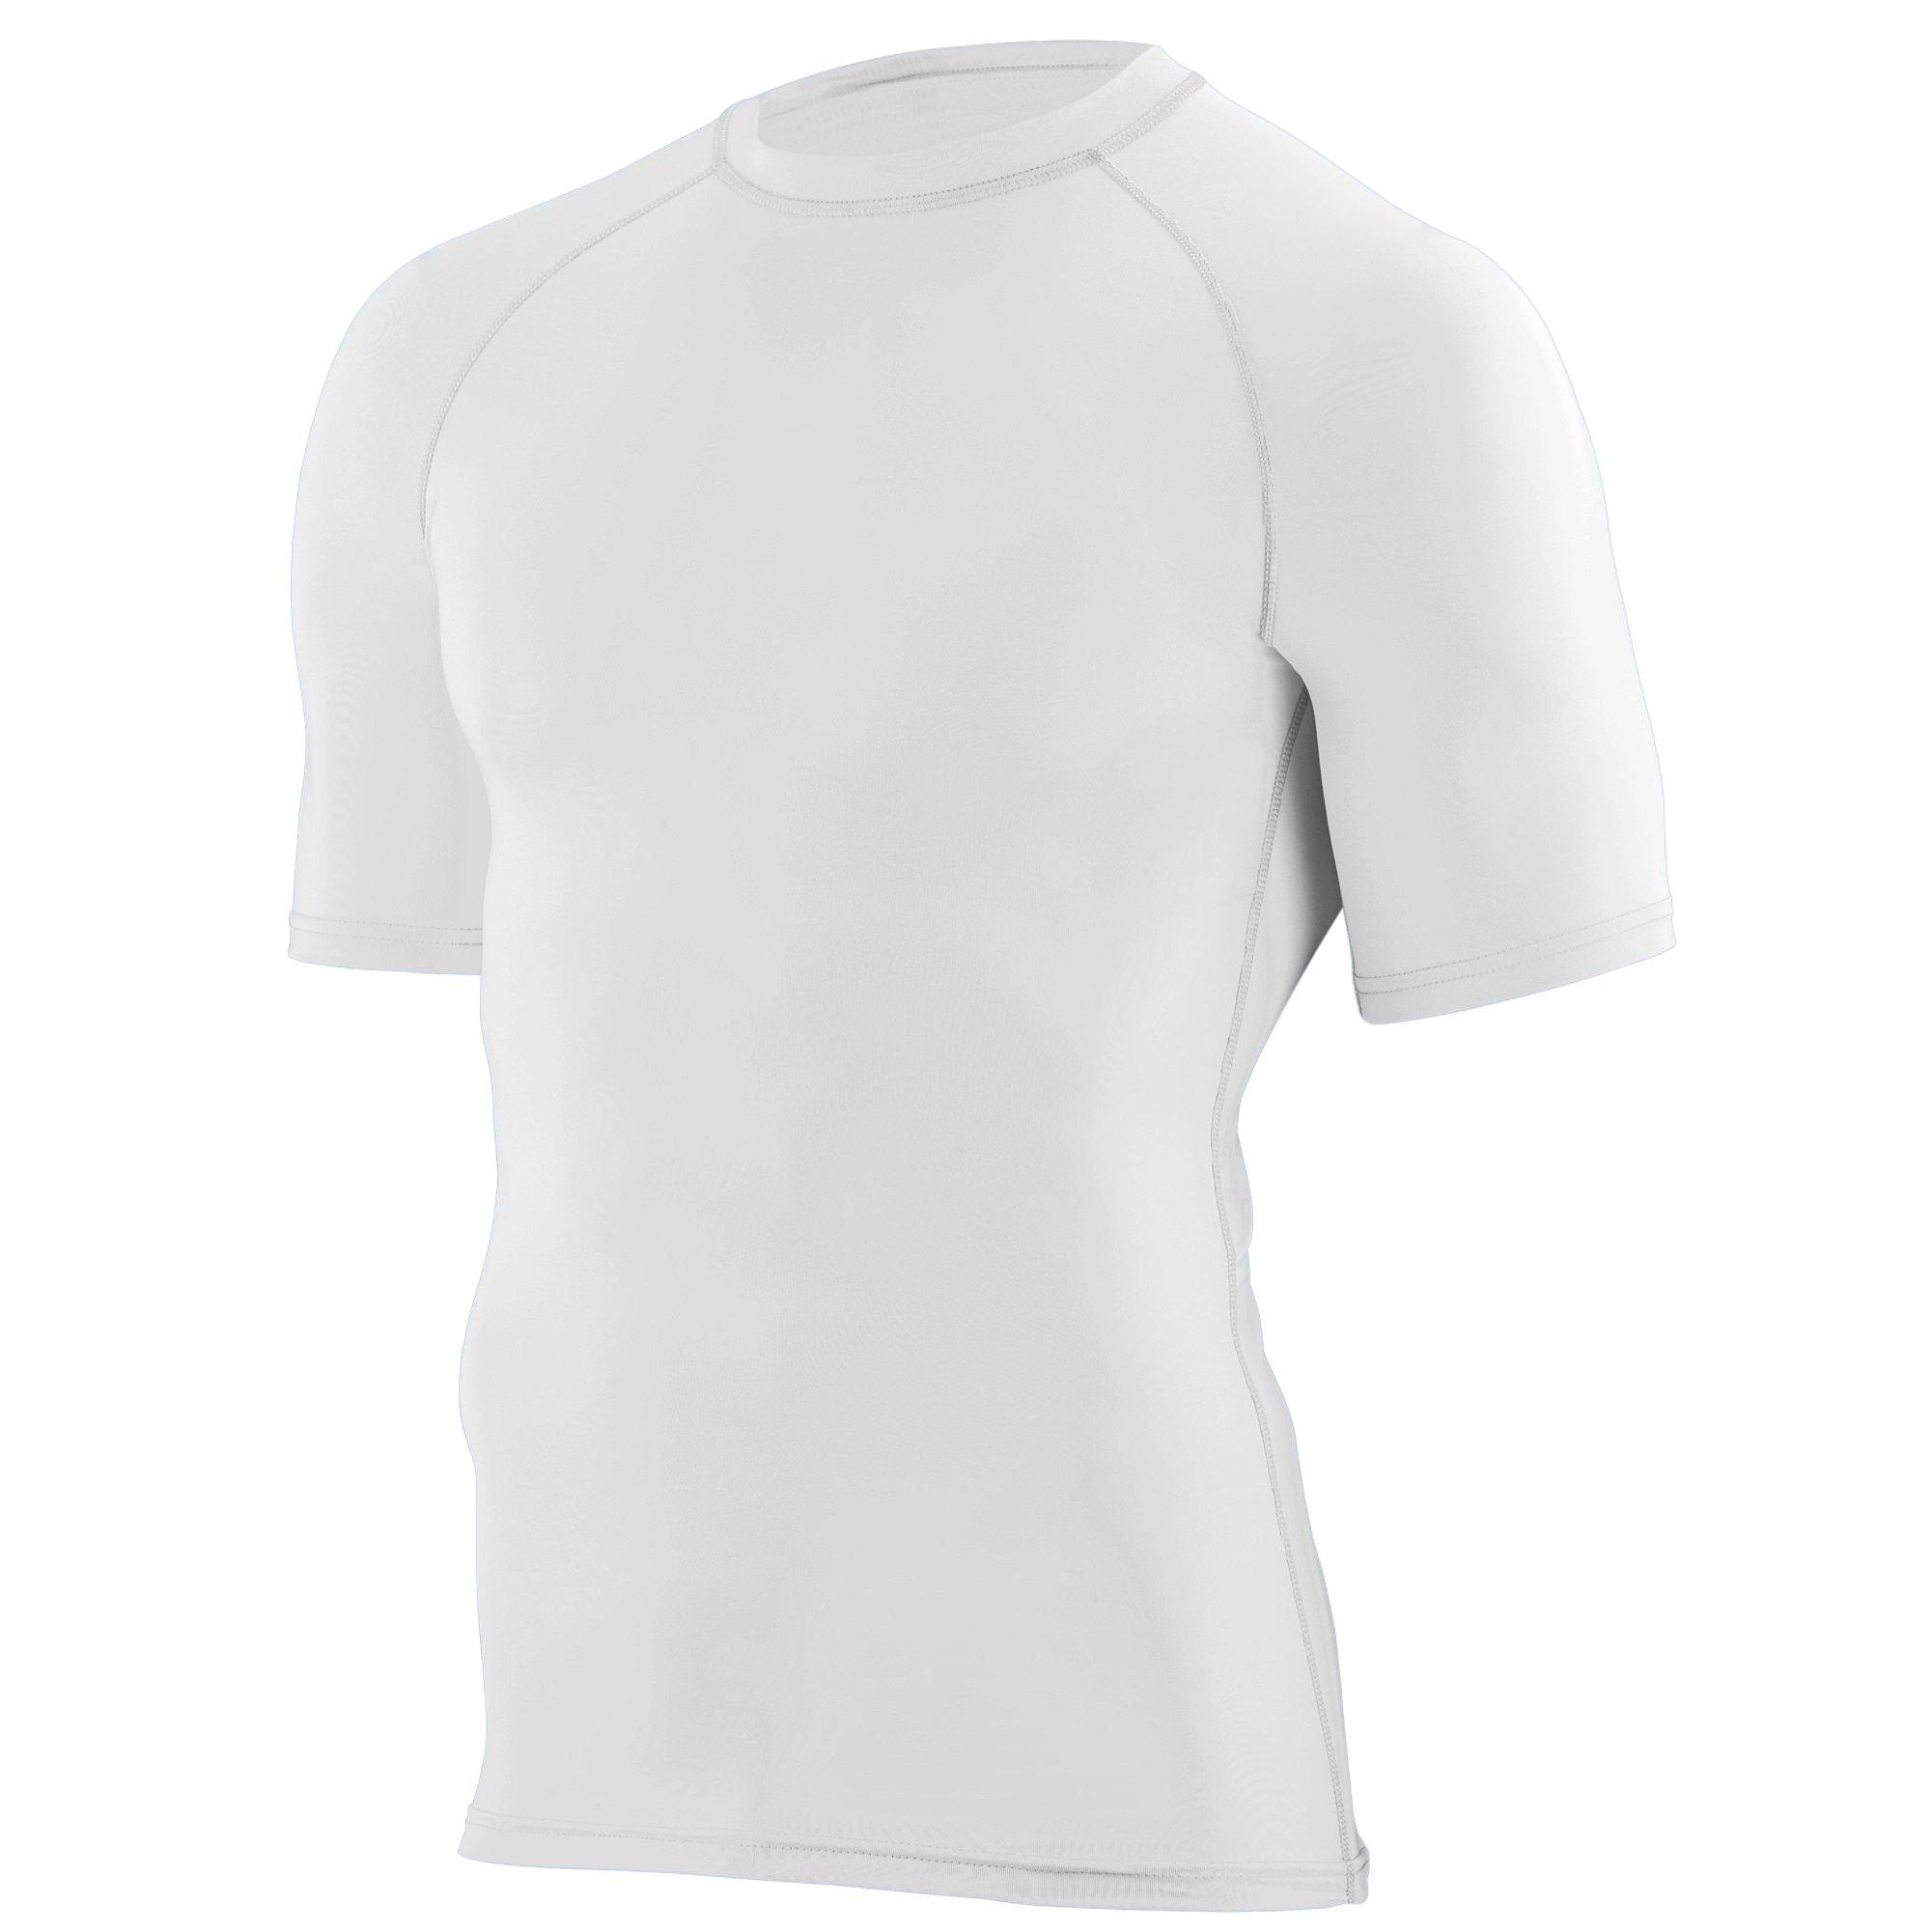 Augusta Sportswear Boys' Hyperform Compression Short Sleeve Shirt S White